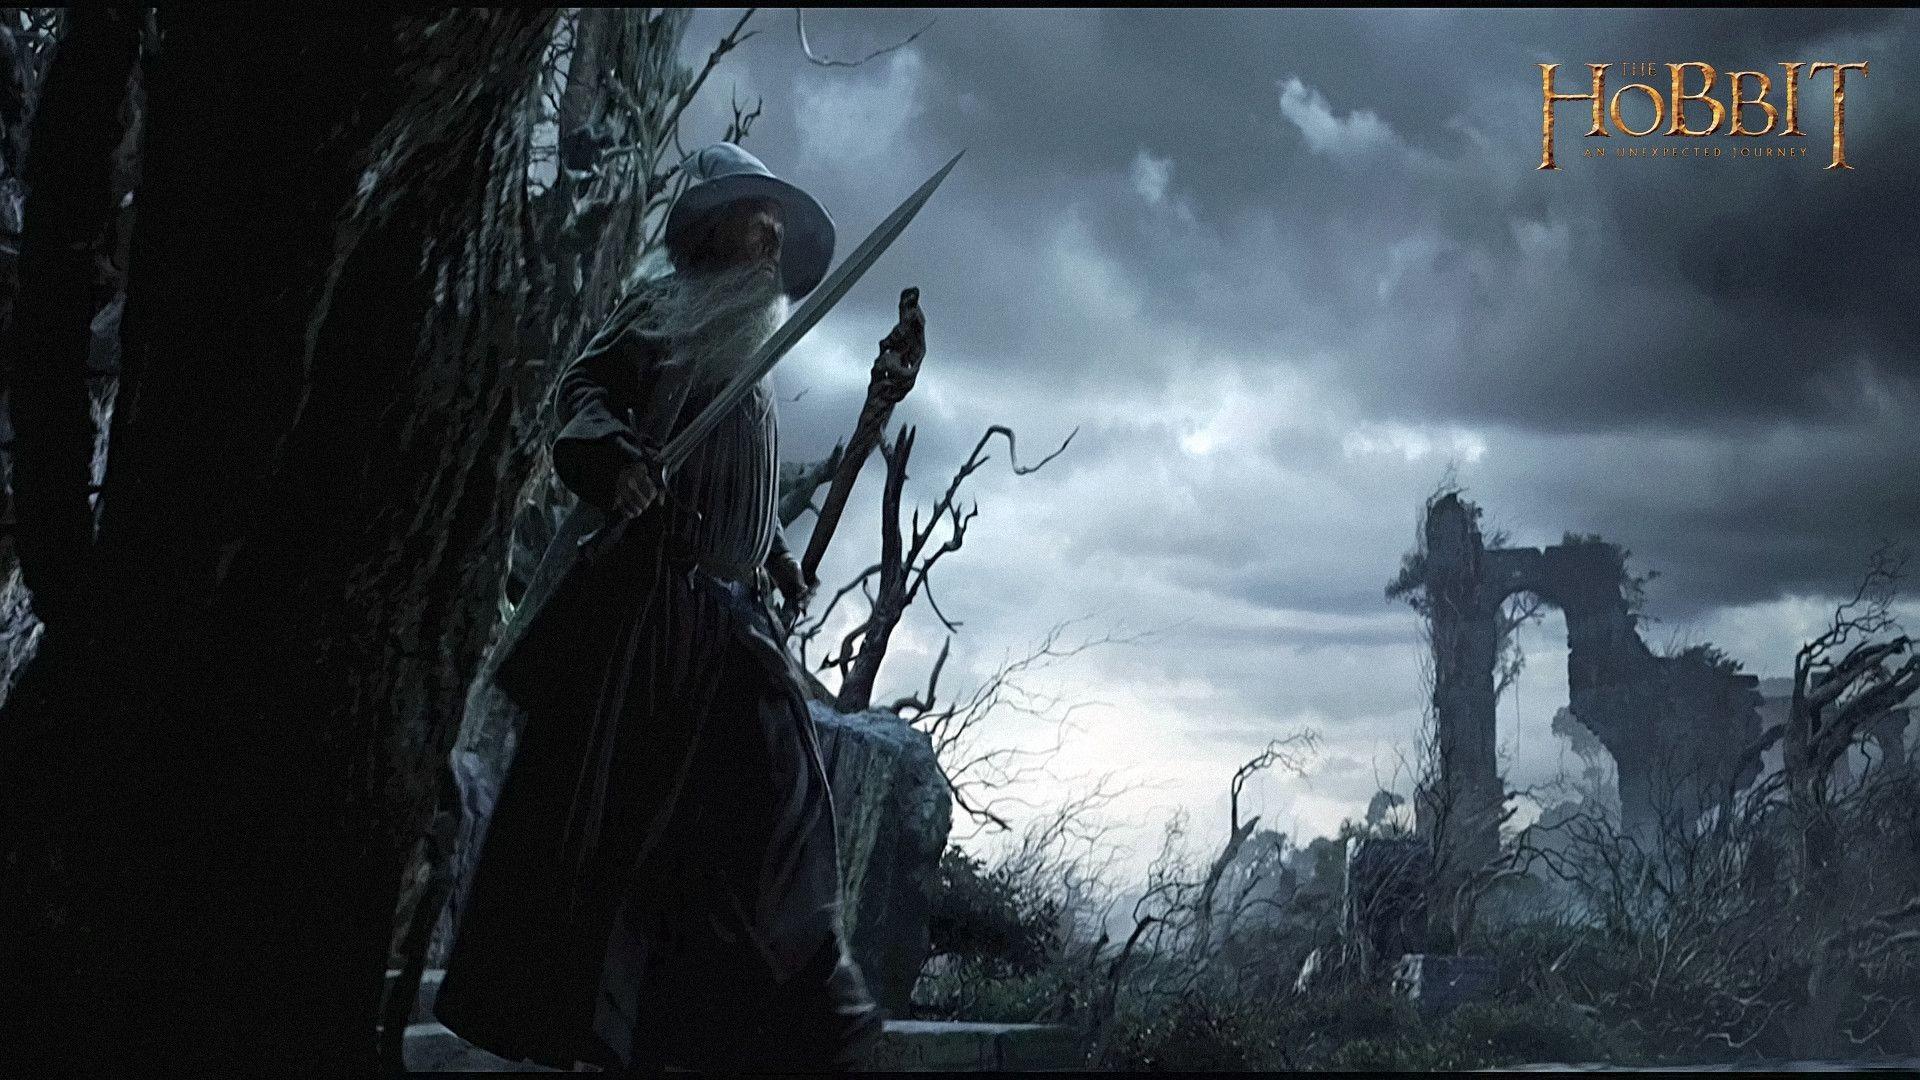 The Hobbit Wallpapers HD – Wallpaper Cave